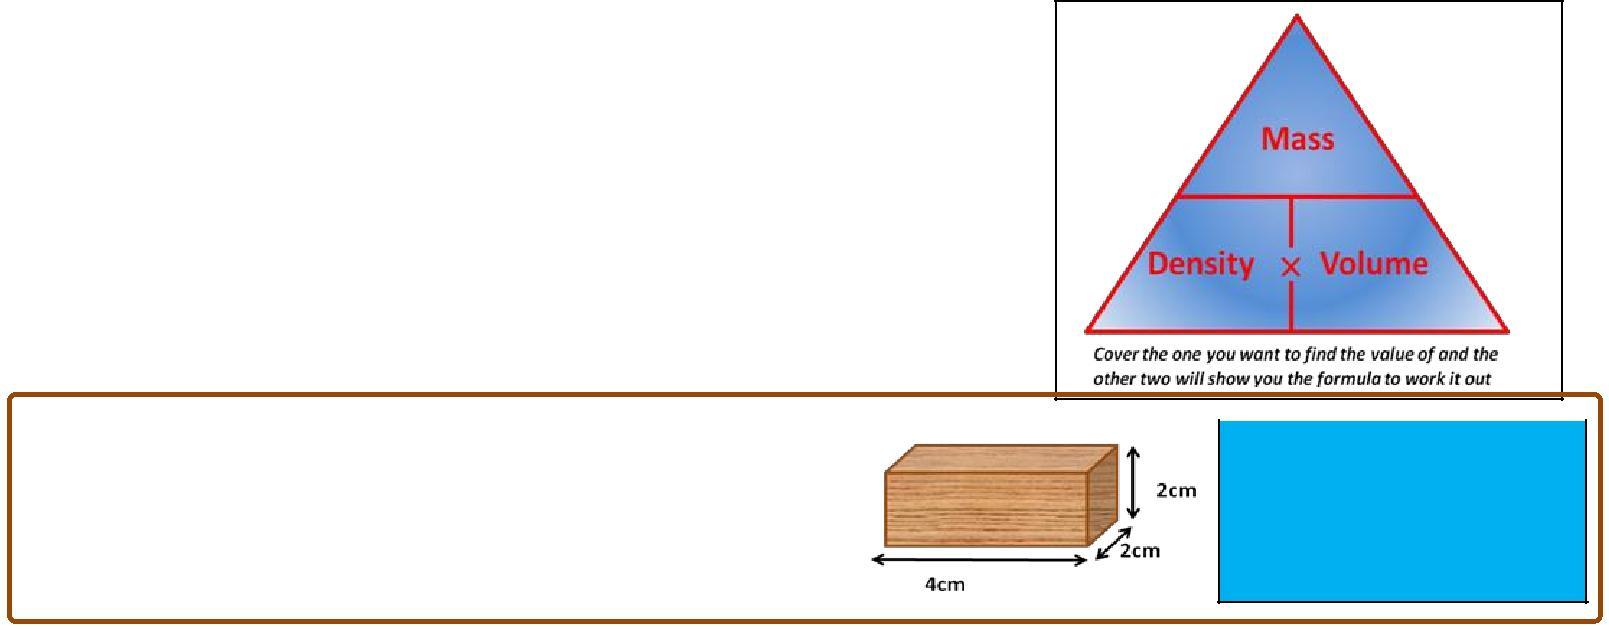 Density the mass per unit volume - Notes - Science - Junior